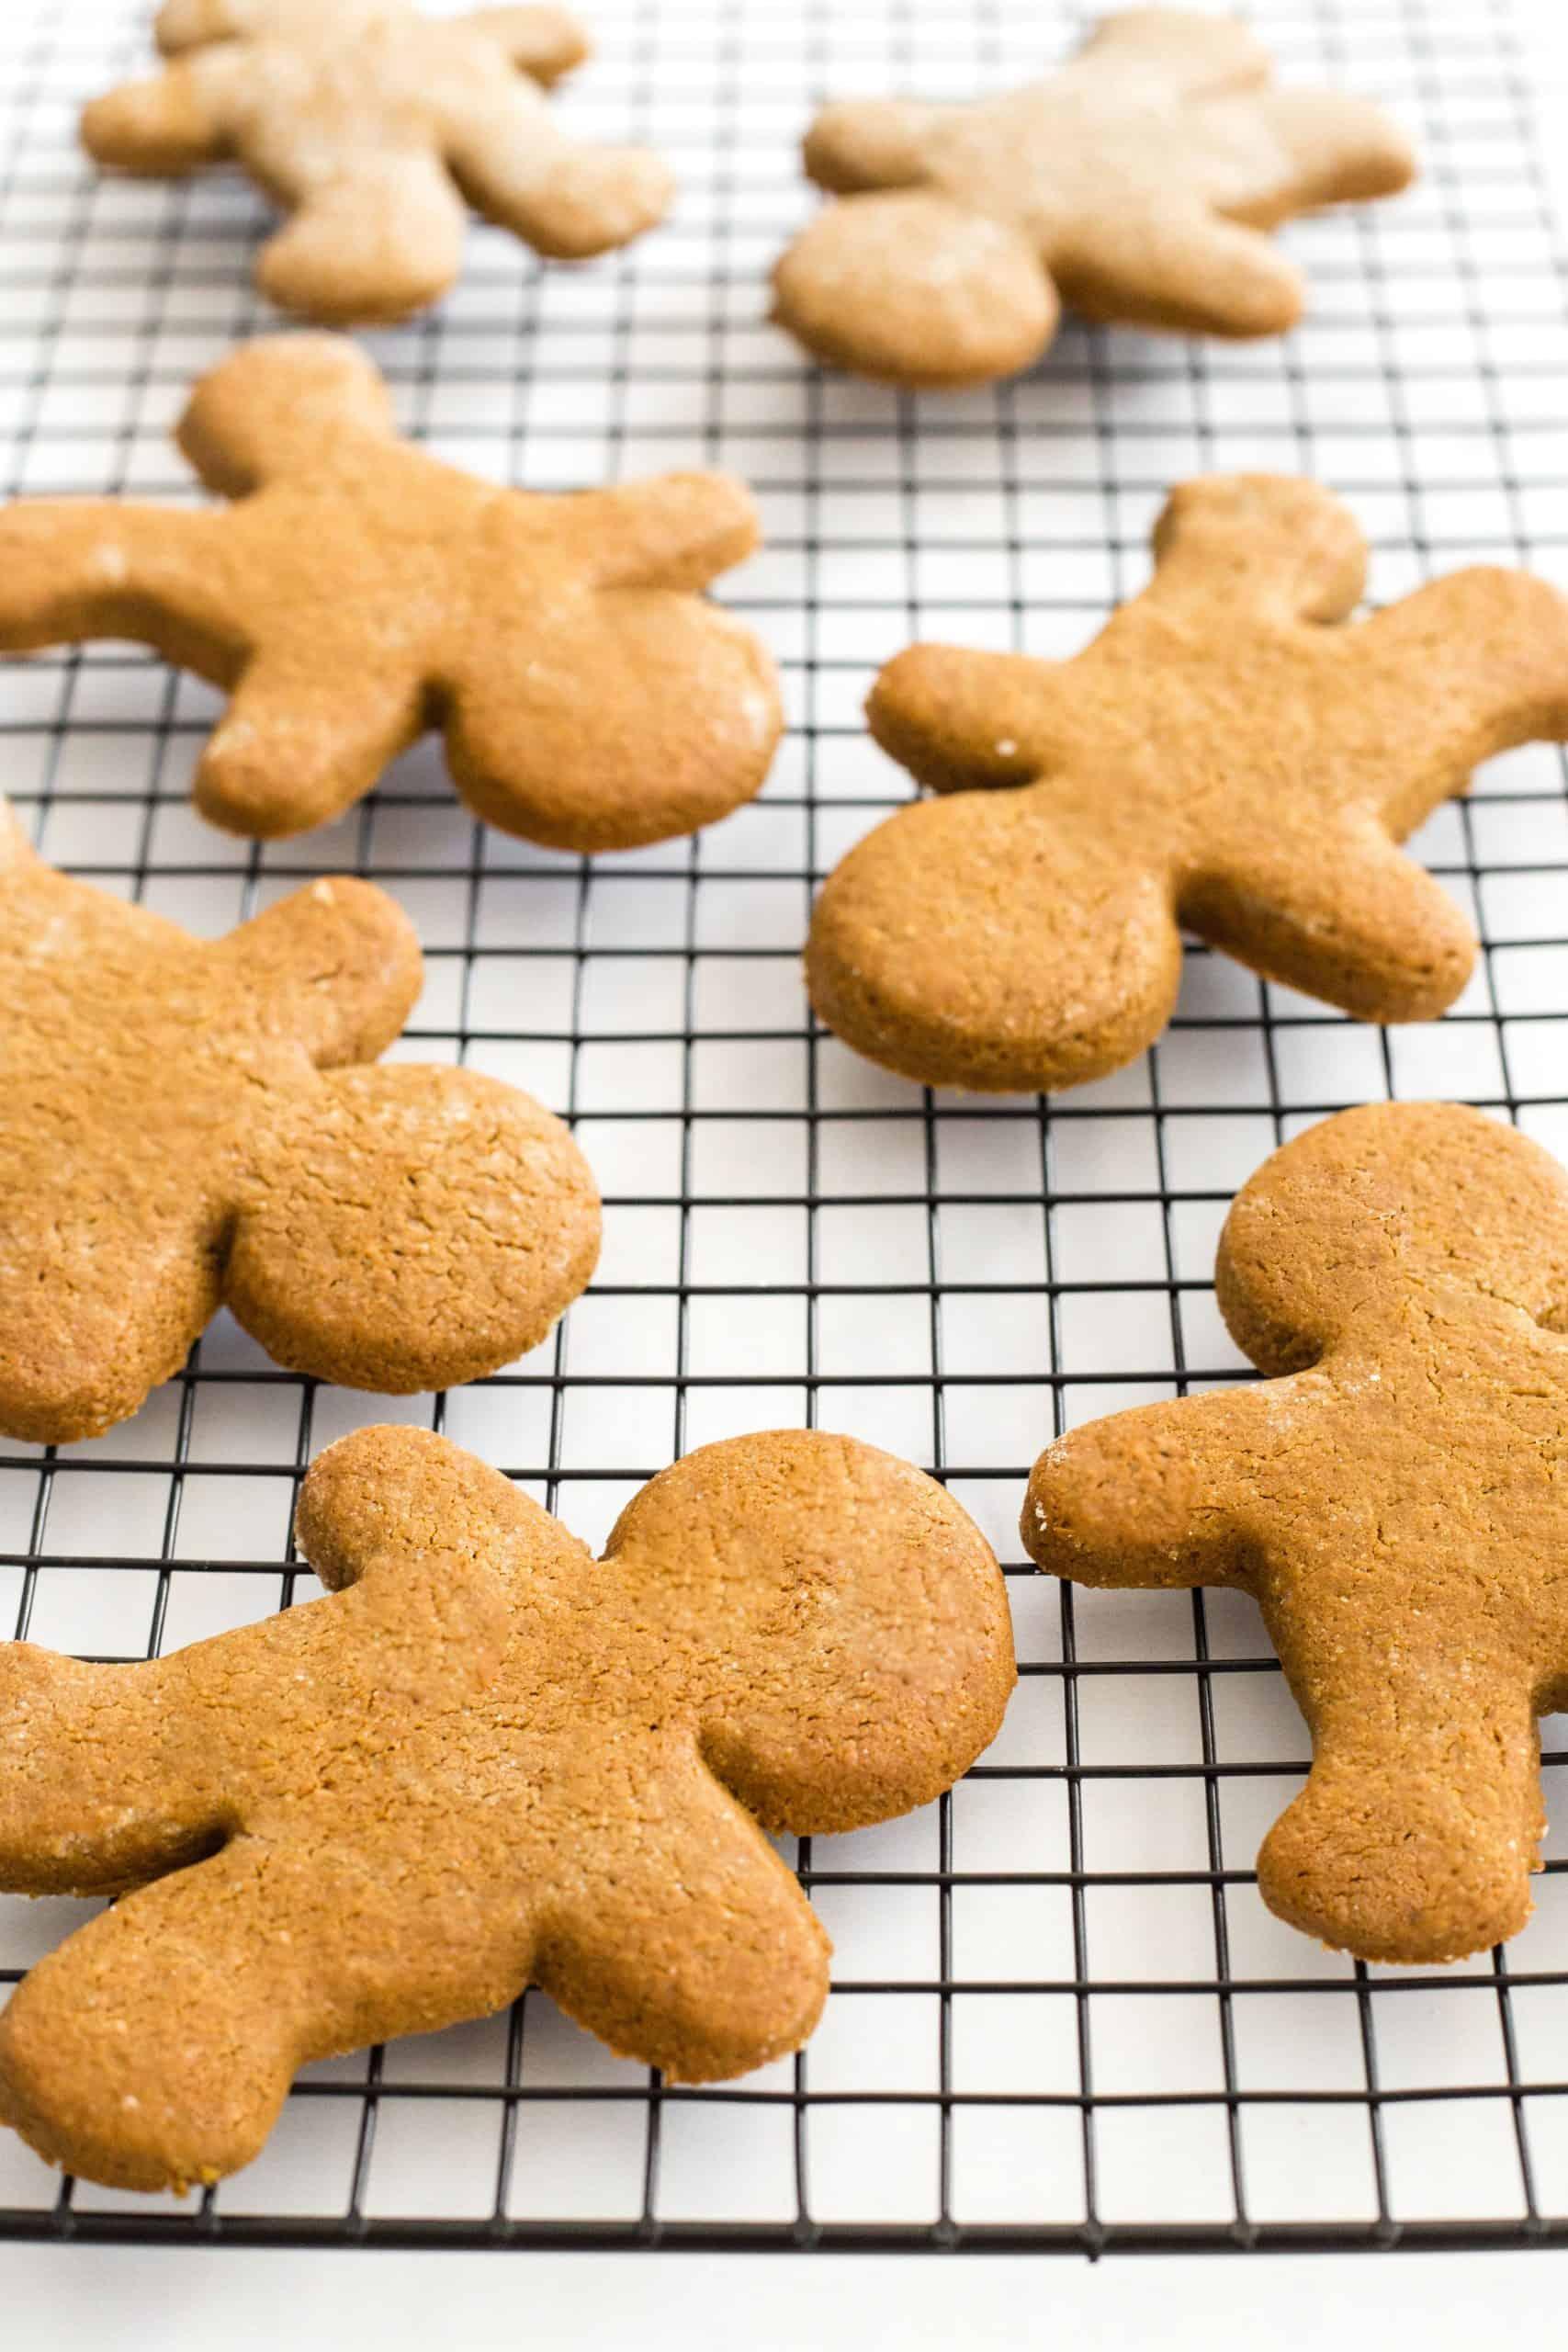 Gingerbread men on wire rack.